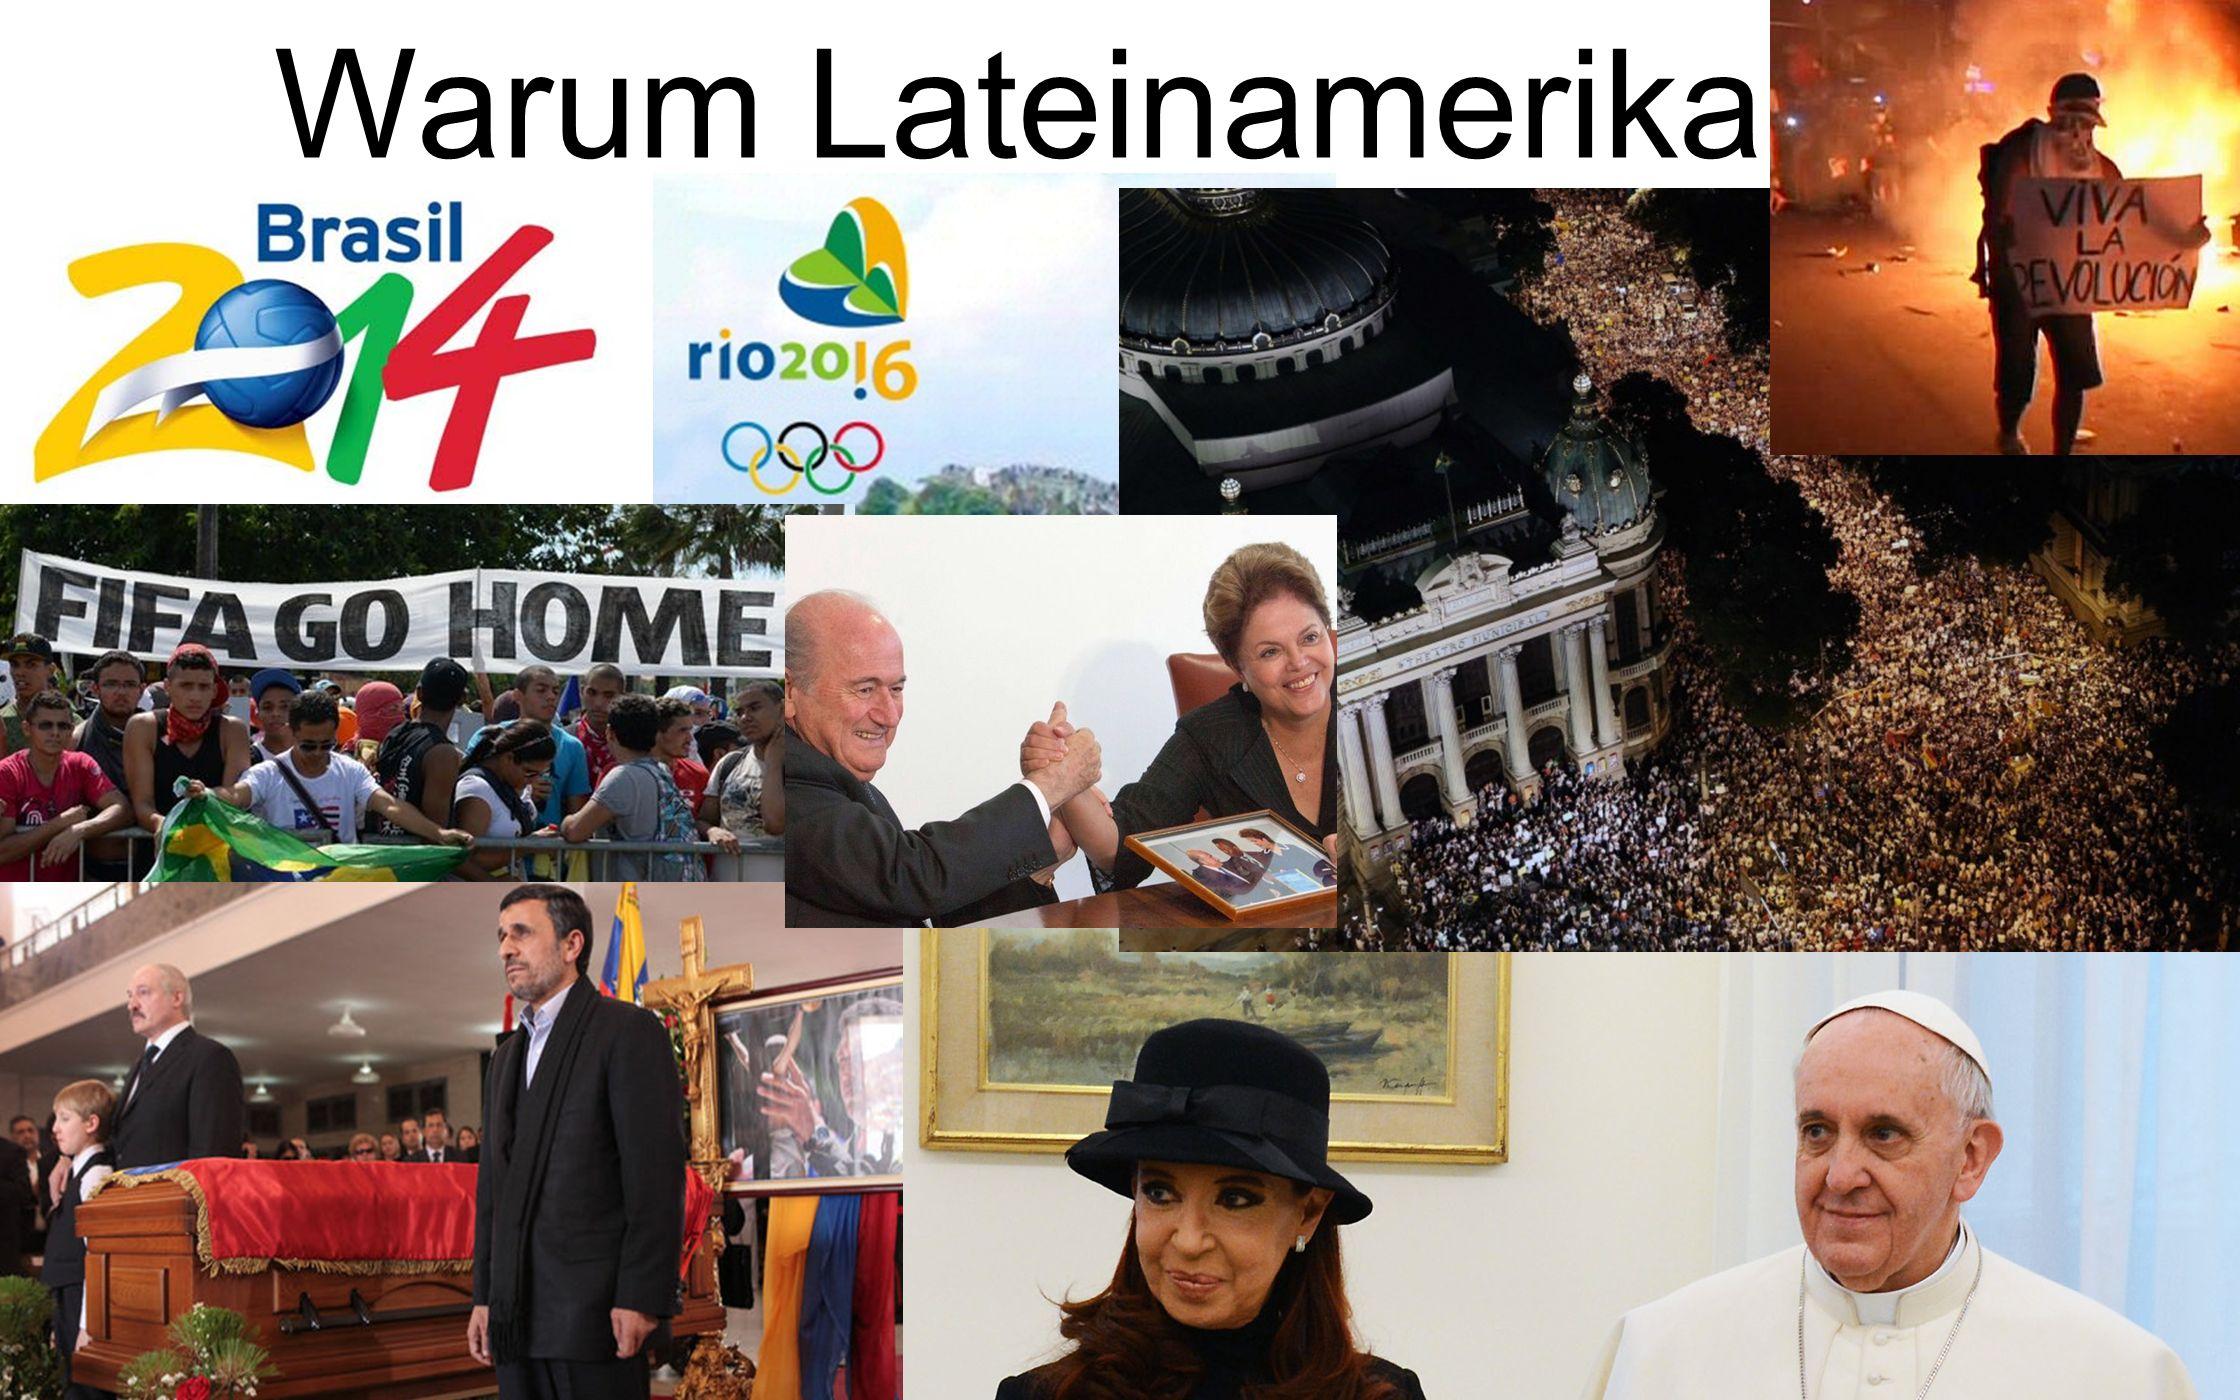 Warum Lateinamerika